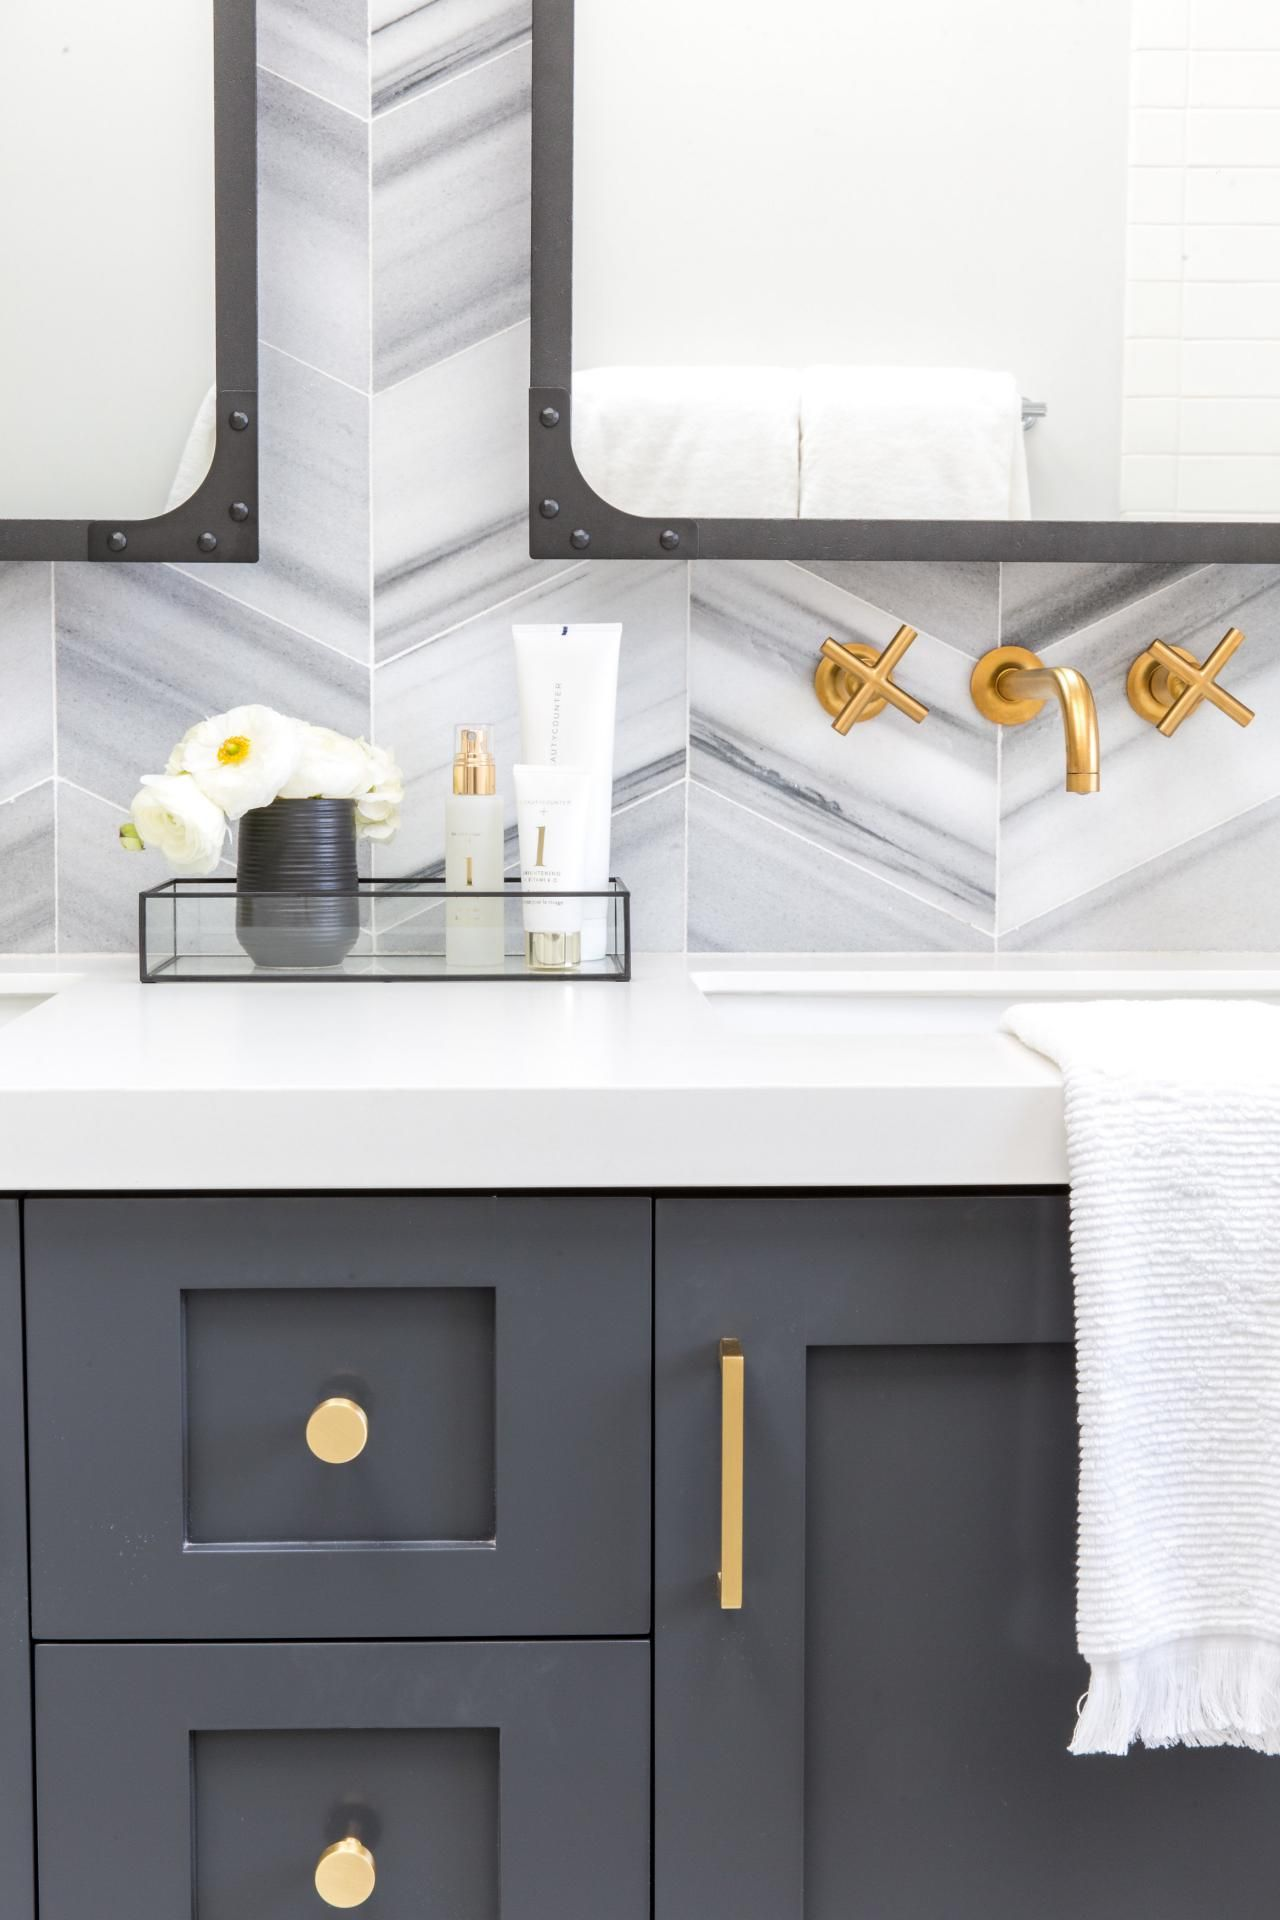 Dark Gray Vanity With Brass Dark Gray Bathroom Vanity With Brass Hardware Chevron Grey Bathroom Vanity Dark Gray Bathroom Grey Bathroom Cabinets